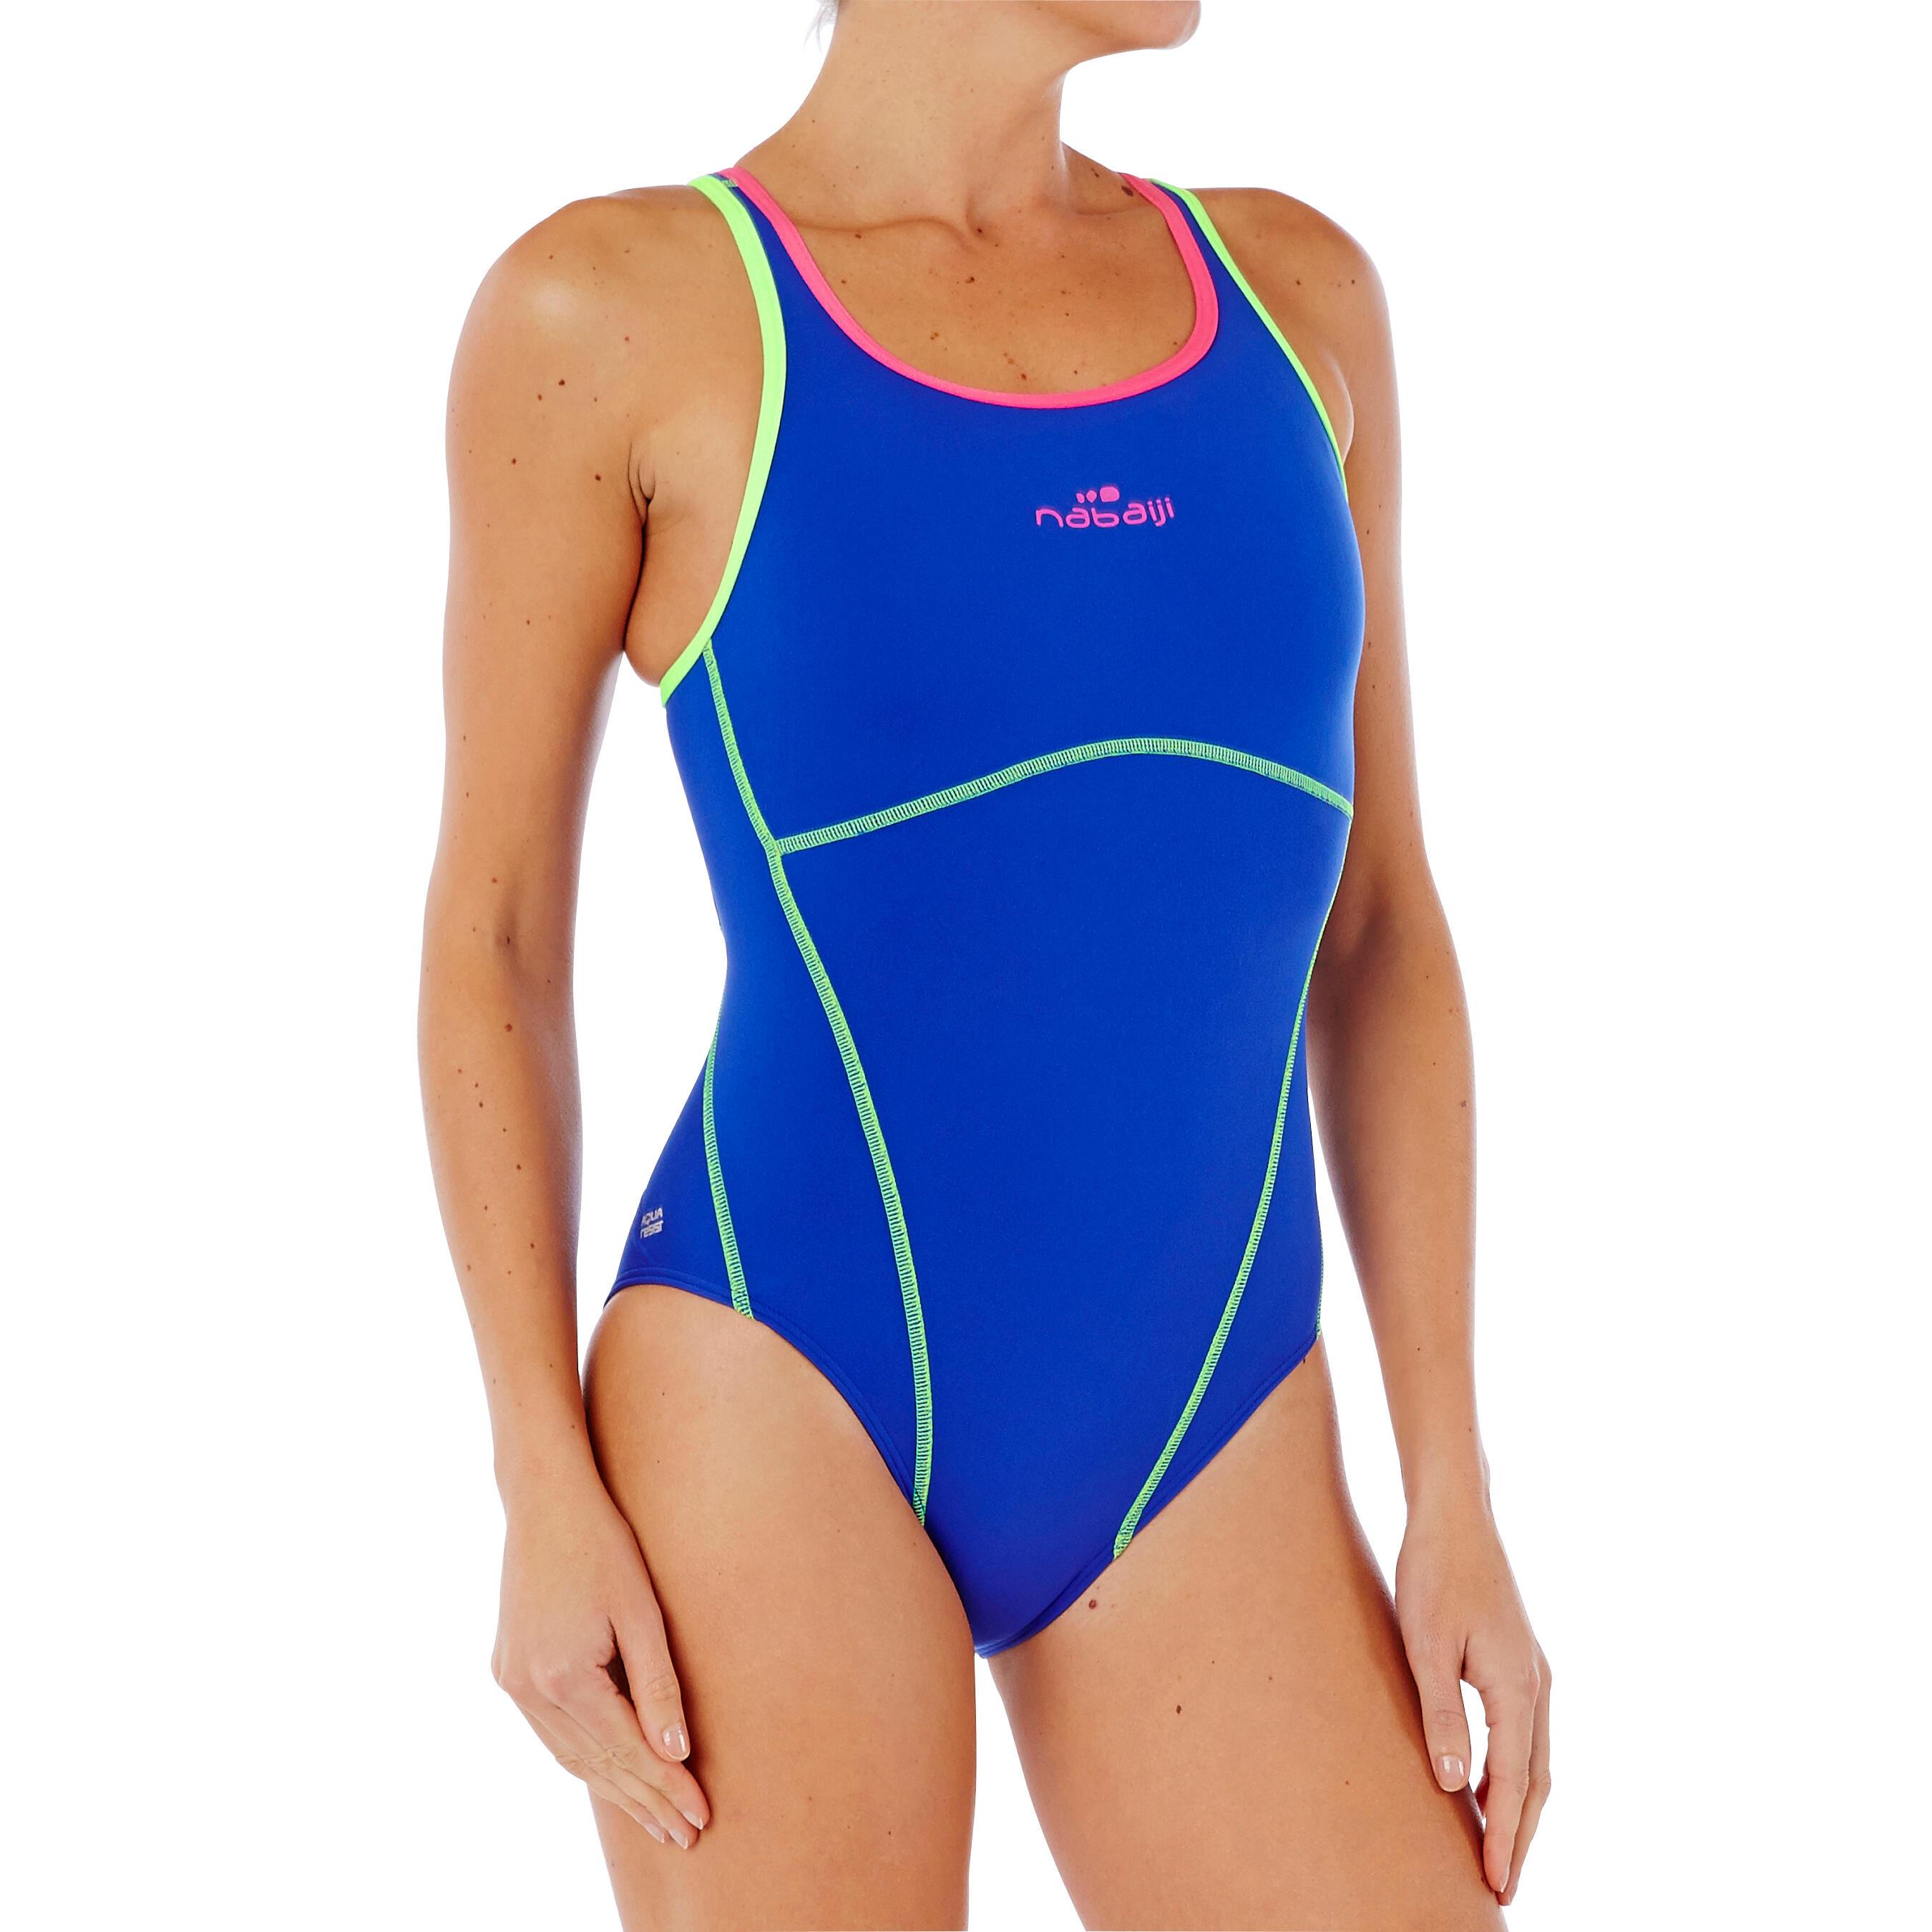 Badpak Zwemmen.Zwempakken Dames Decathlon